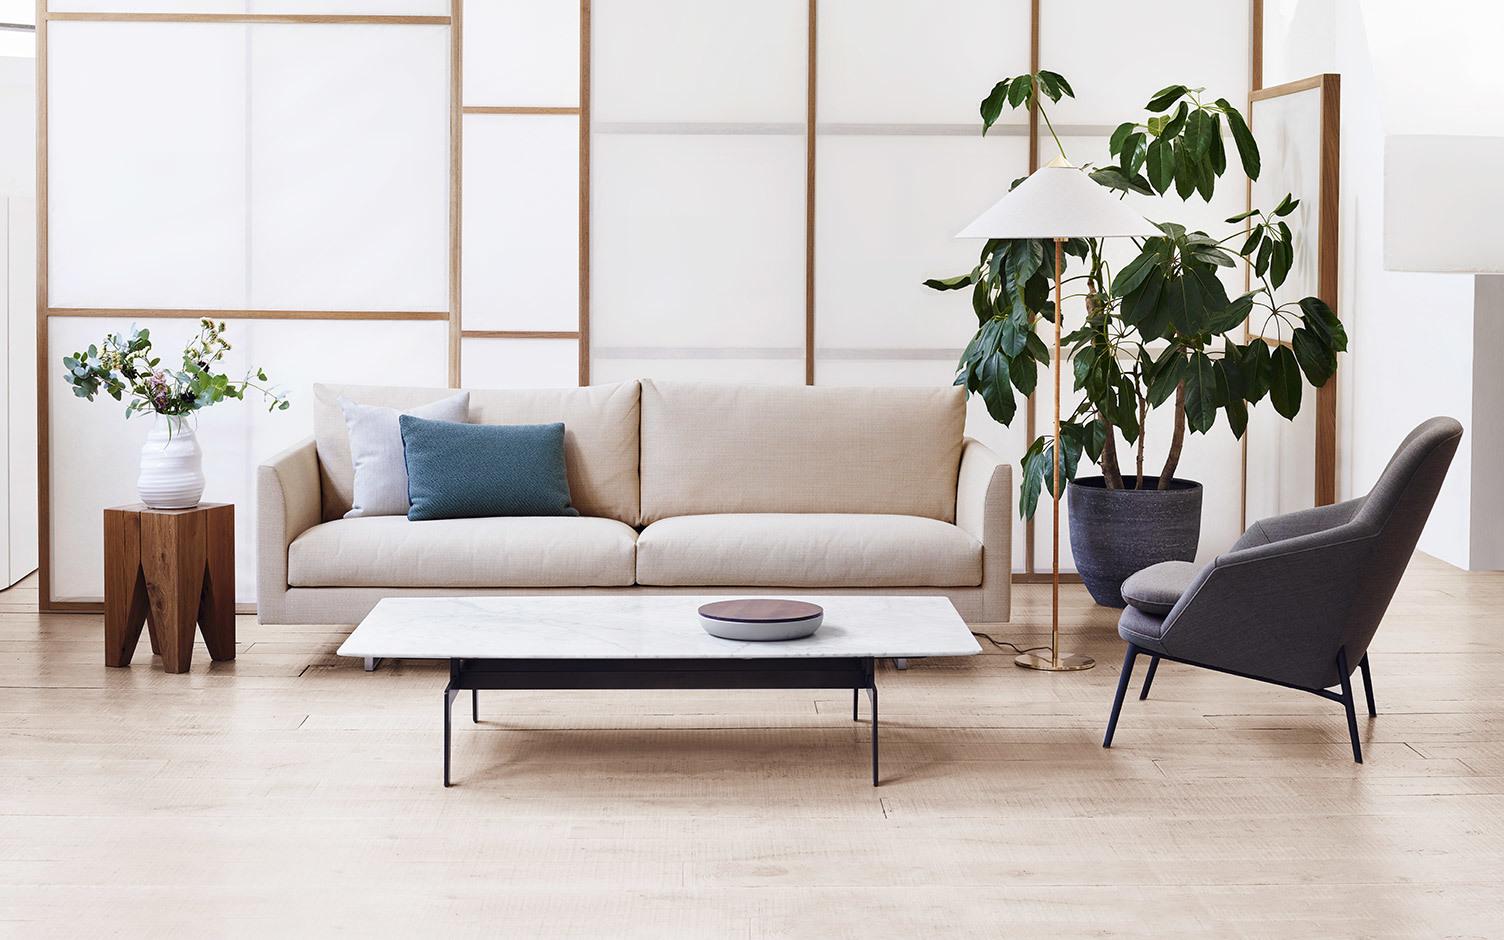 Sofas & Lounge Seating catalogue image